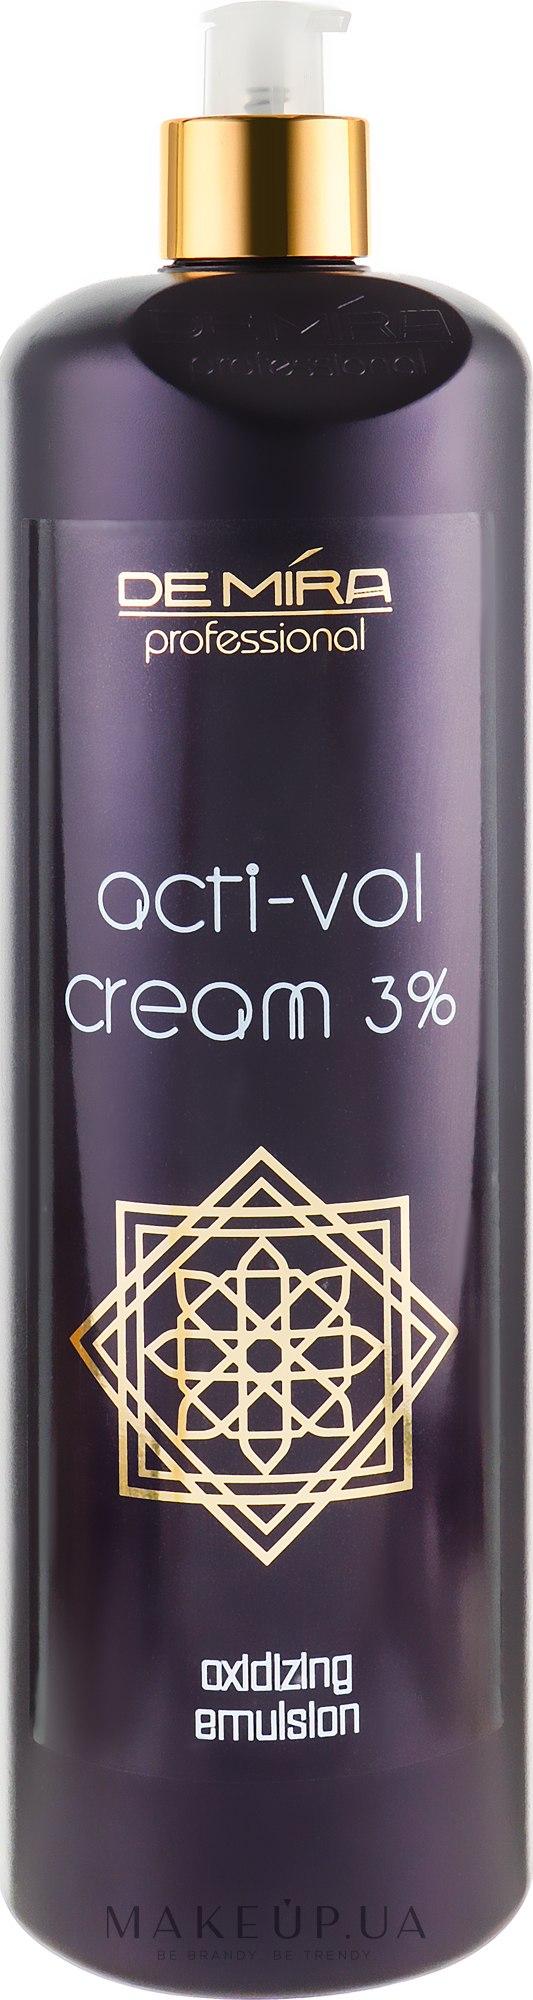 Окисляющая эмульсия 3% - Demira Professional Acti-Vol Cream — фото 1000ml